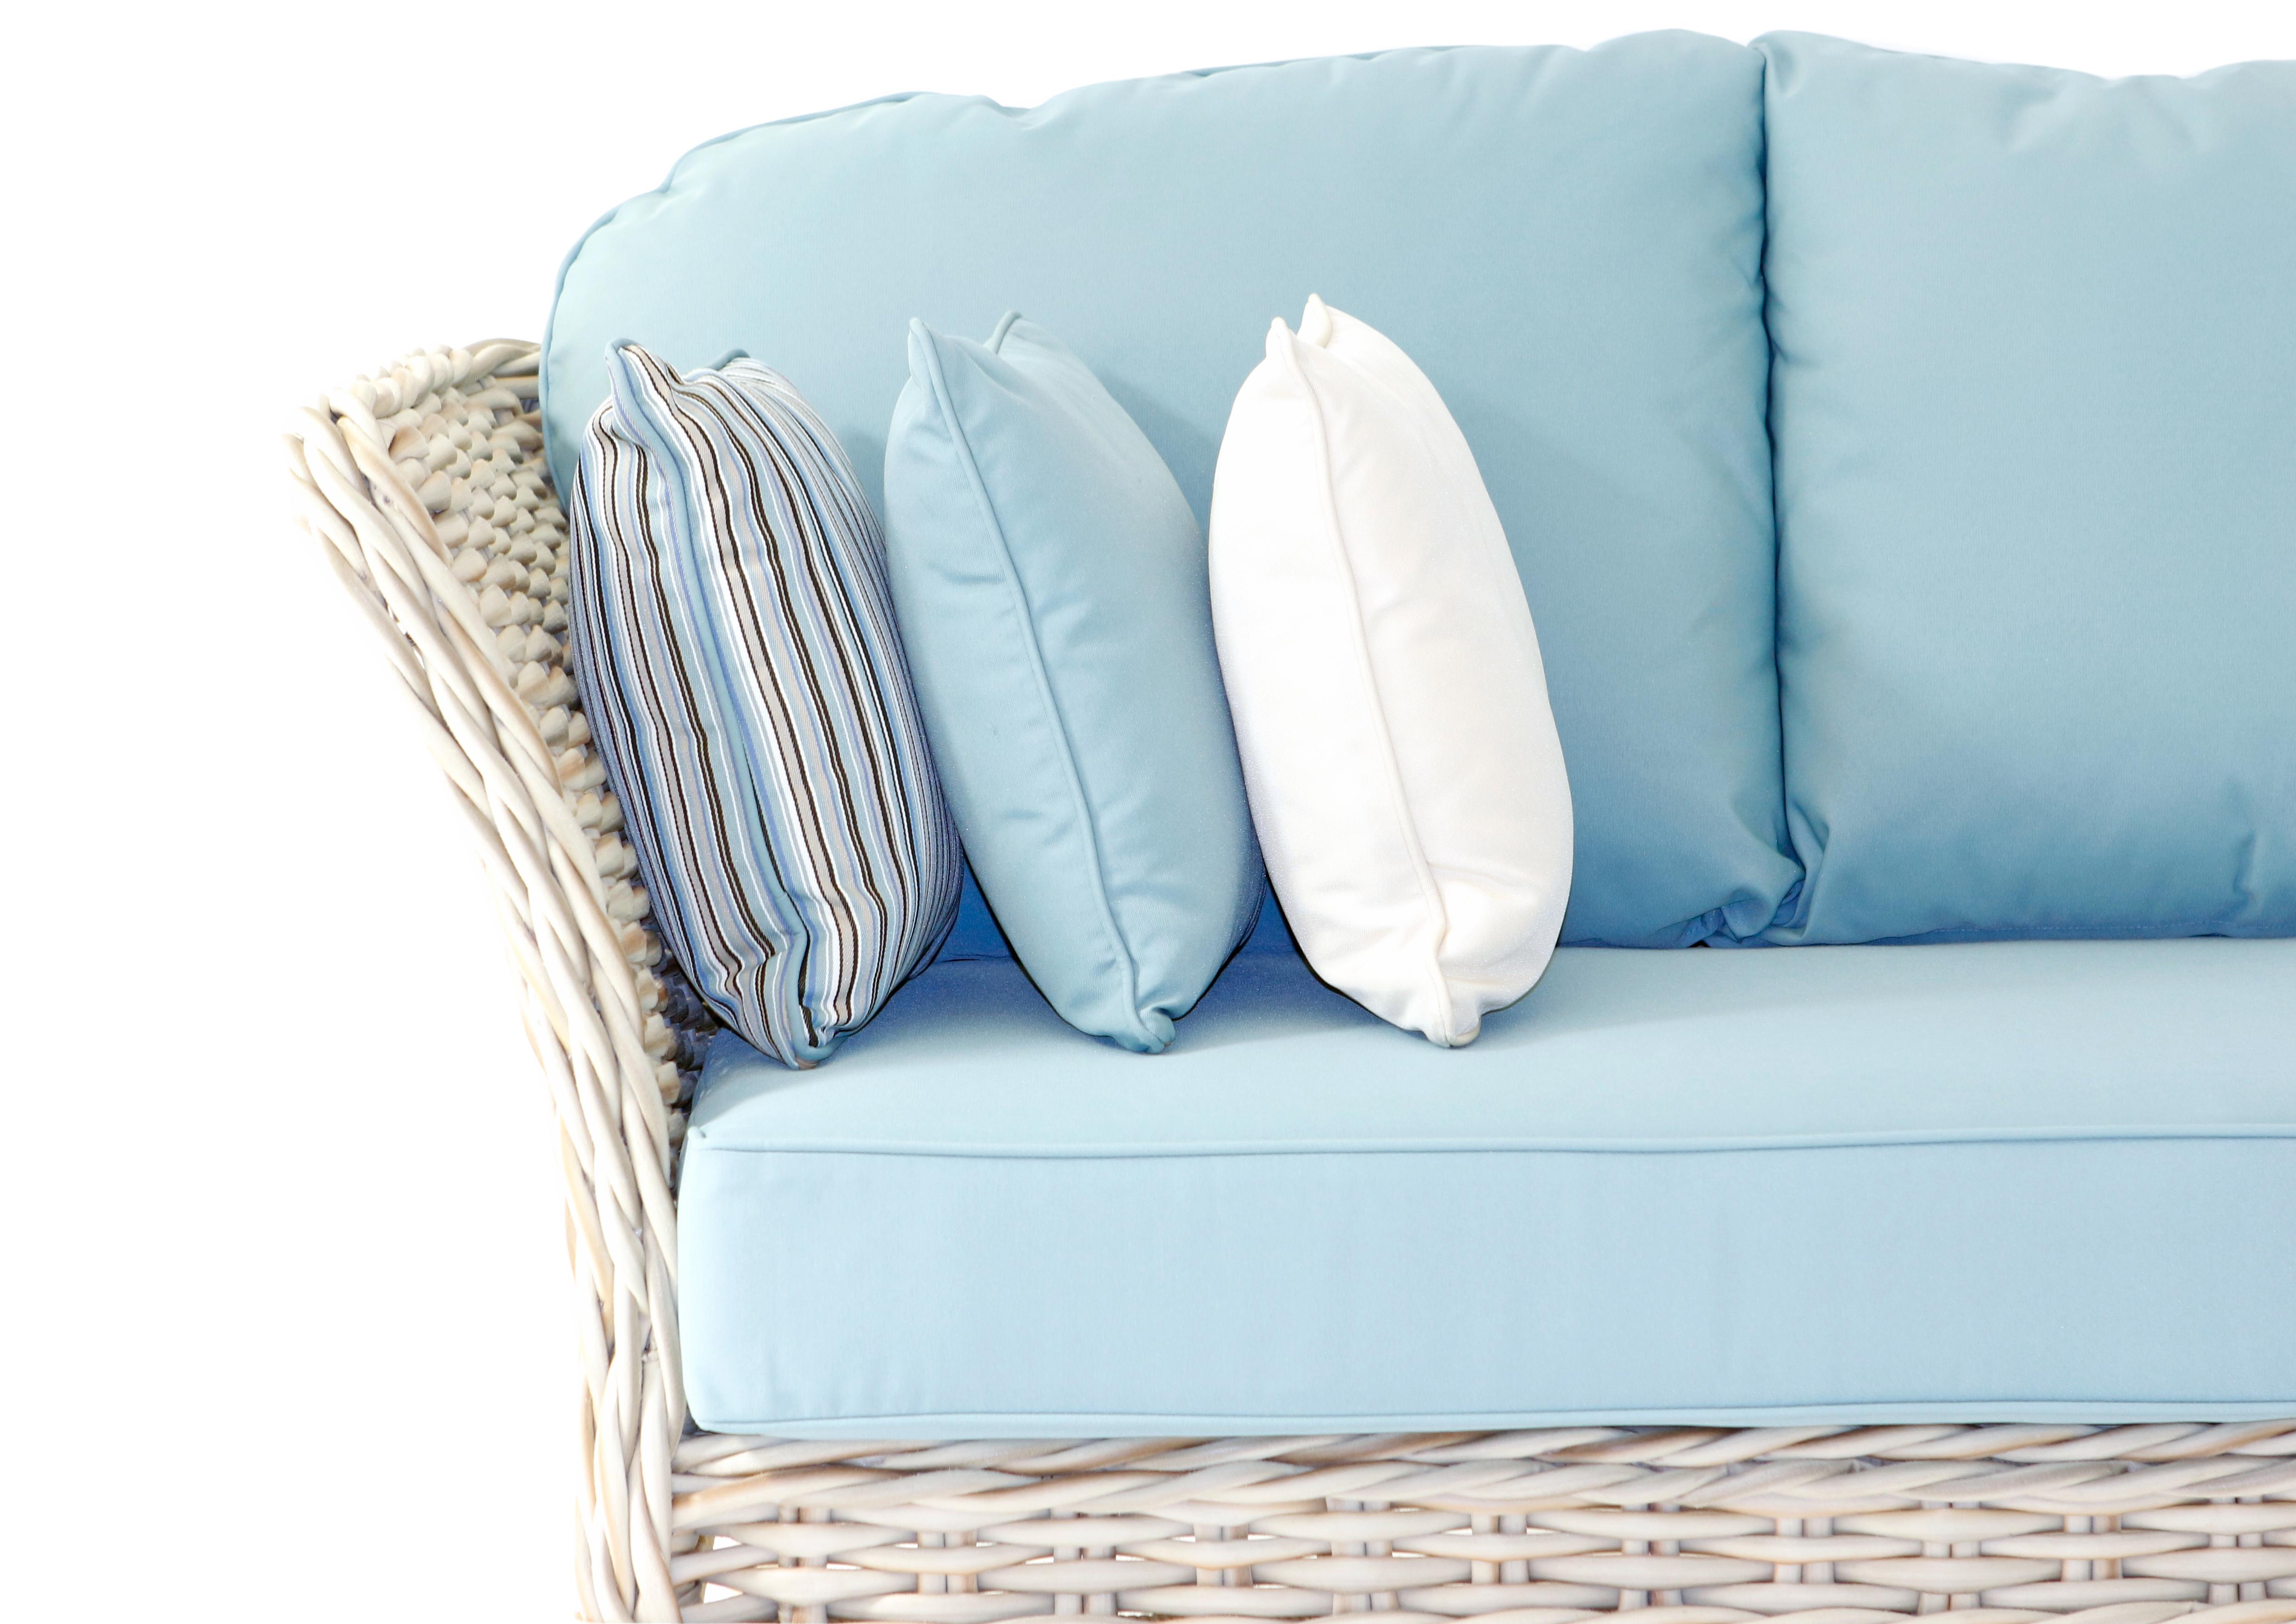 barcelona lounging corner sofa close up